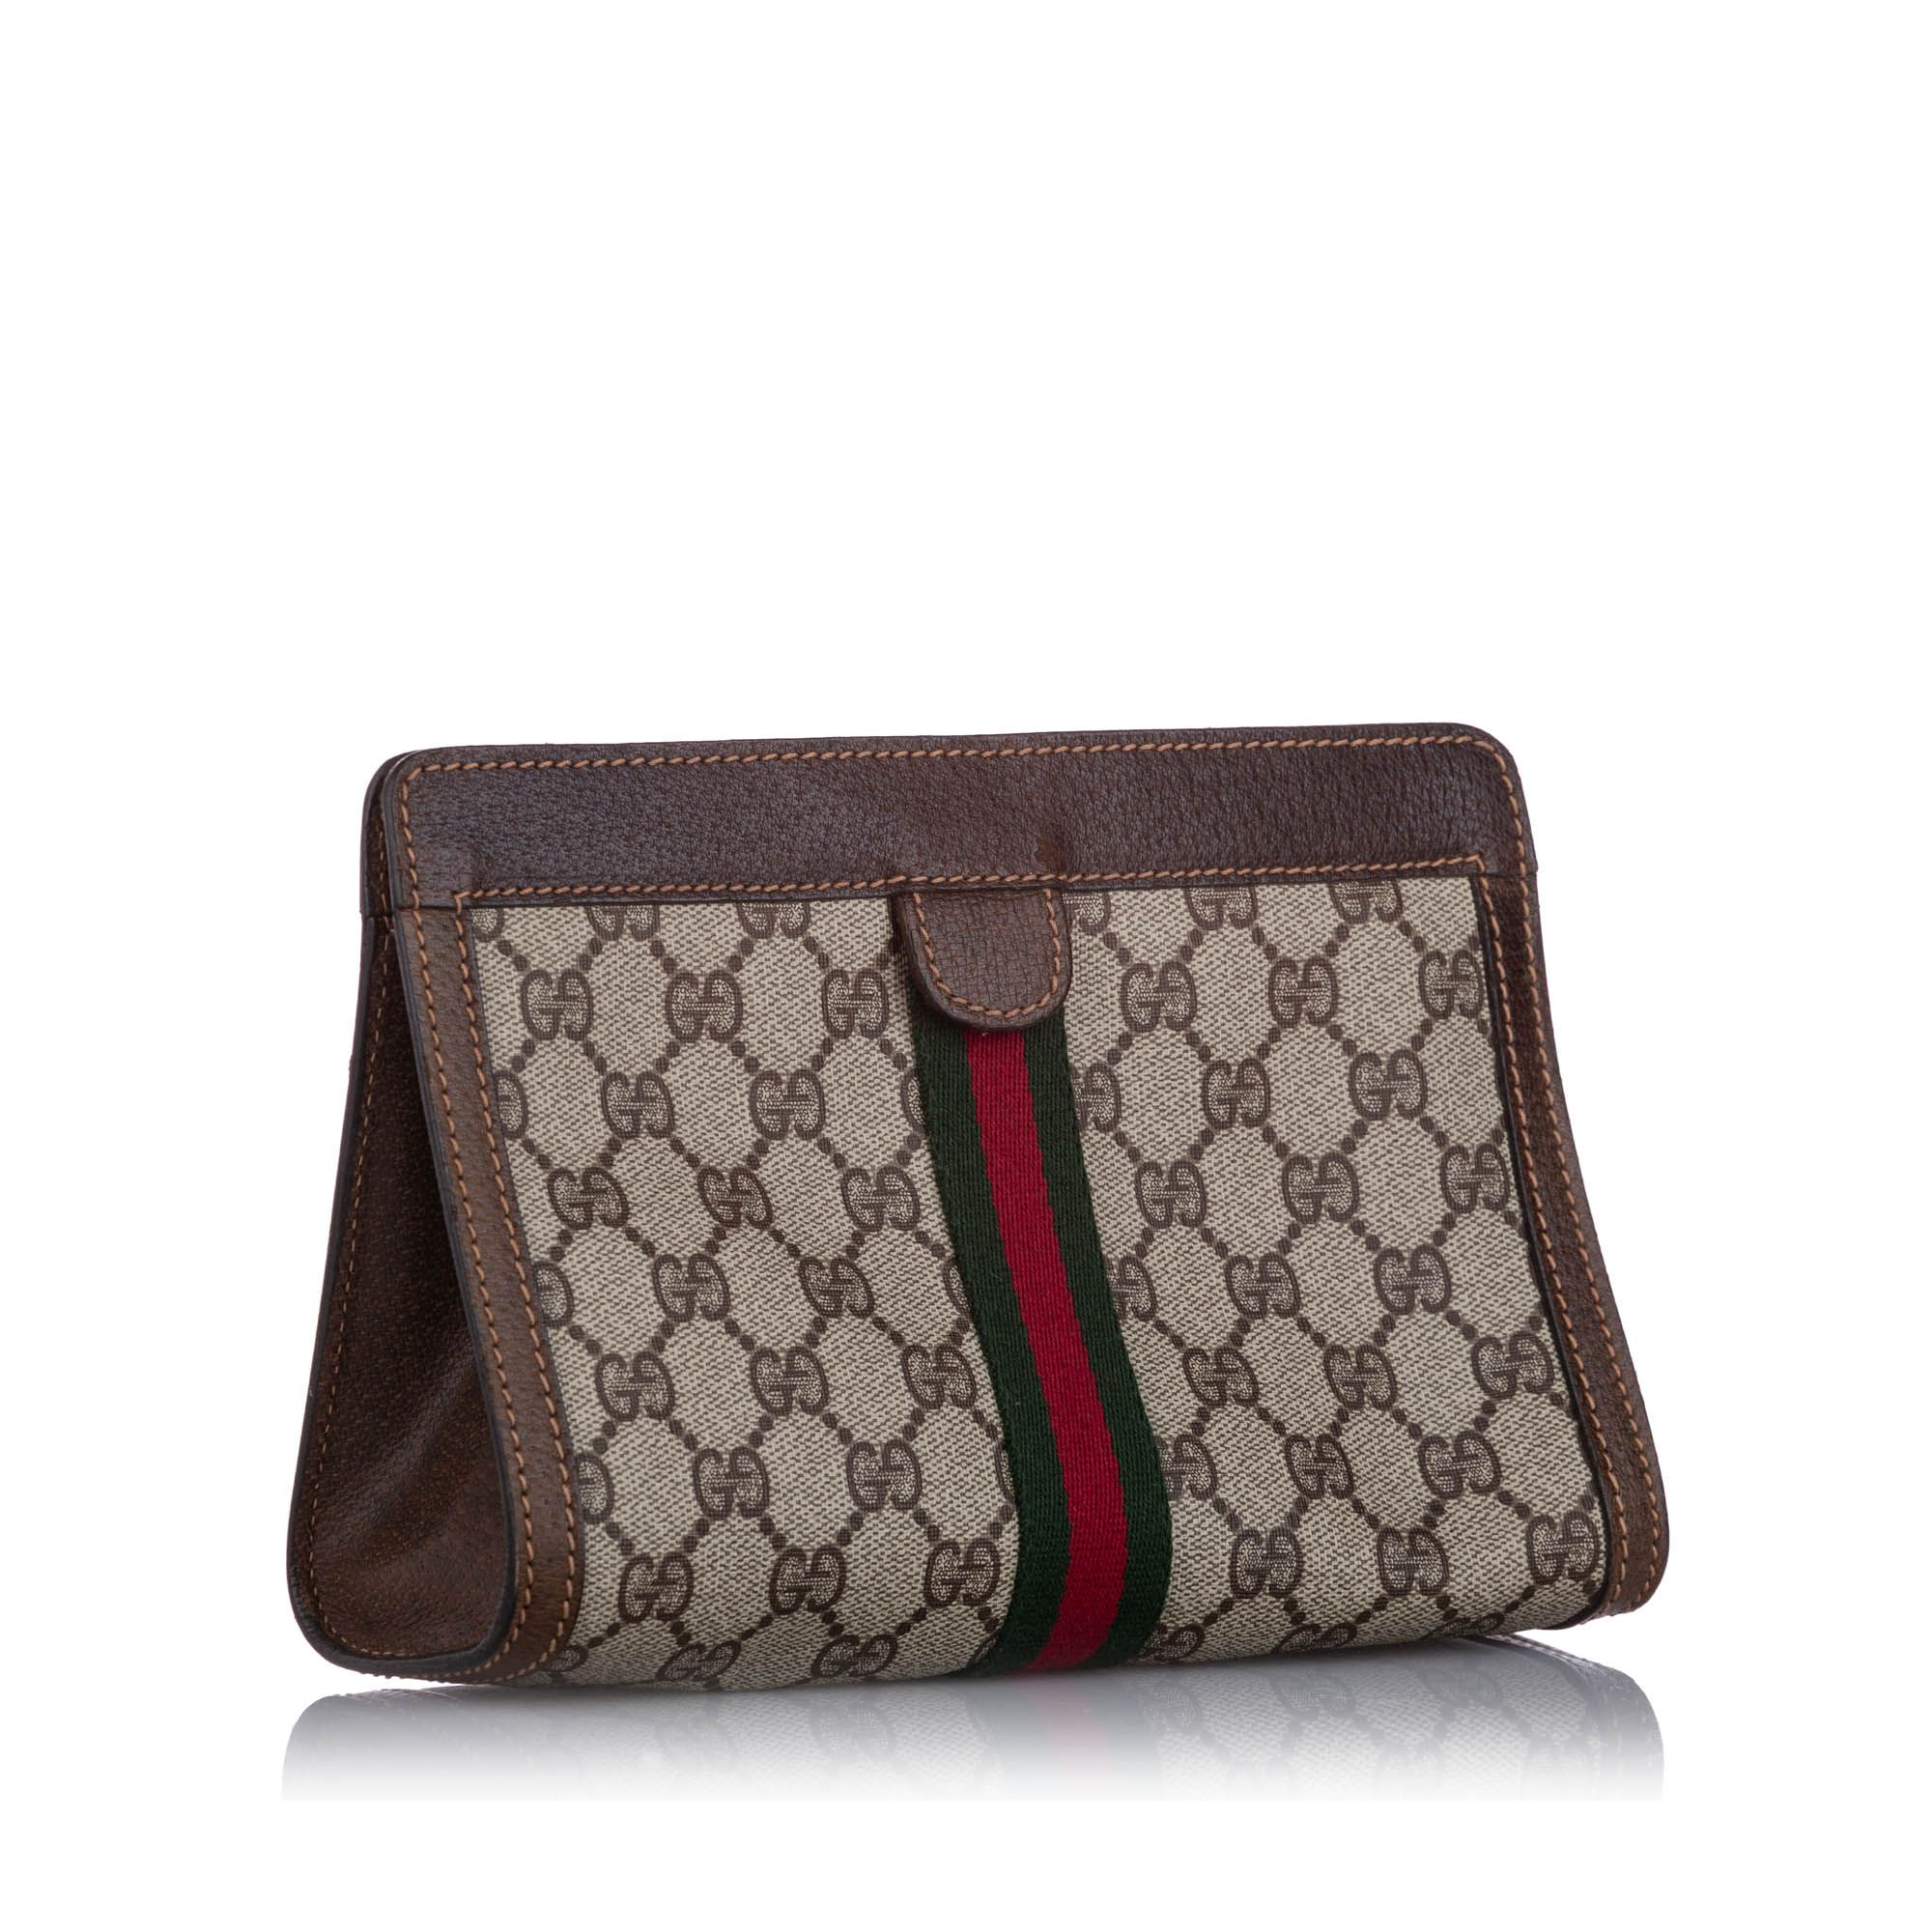 Vintage Gucci GG Supreme Web Clutch Bag Brown